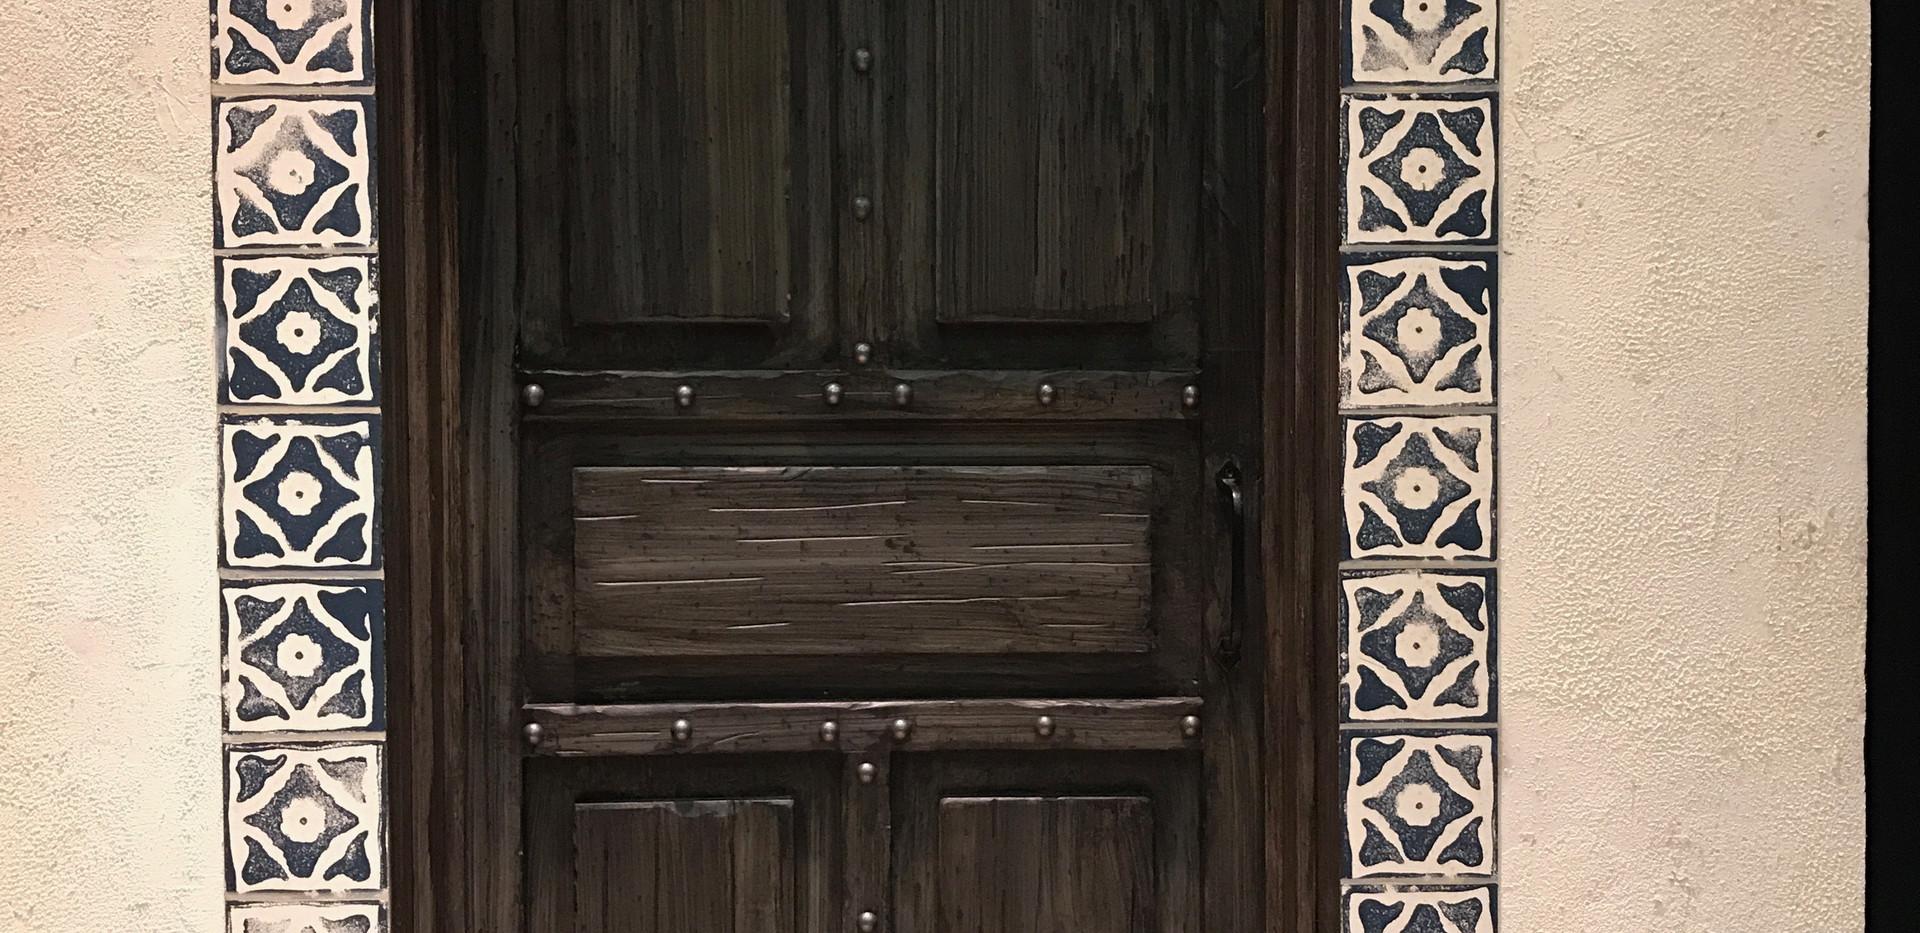 House of Bernarda Alba